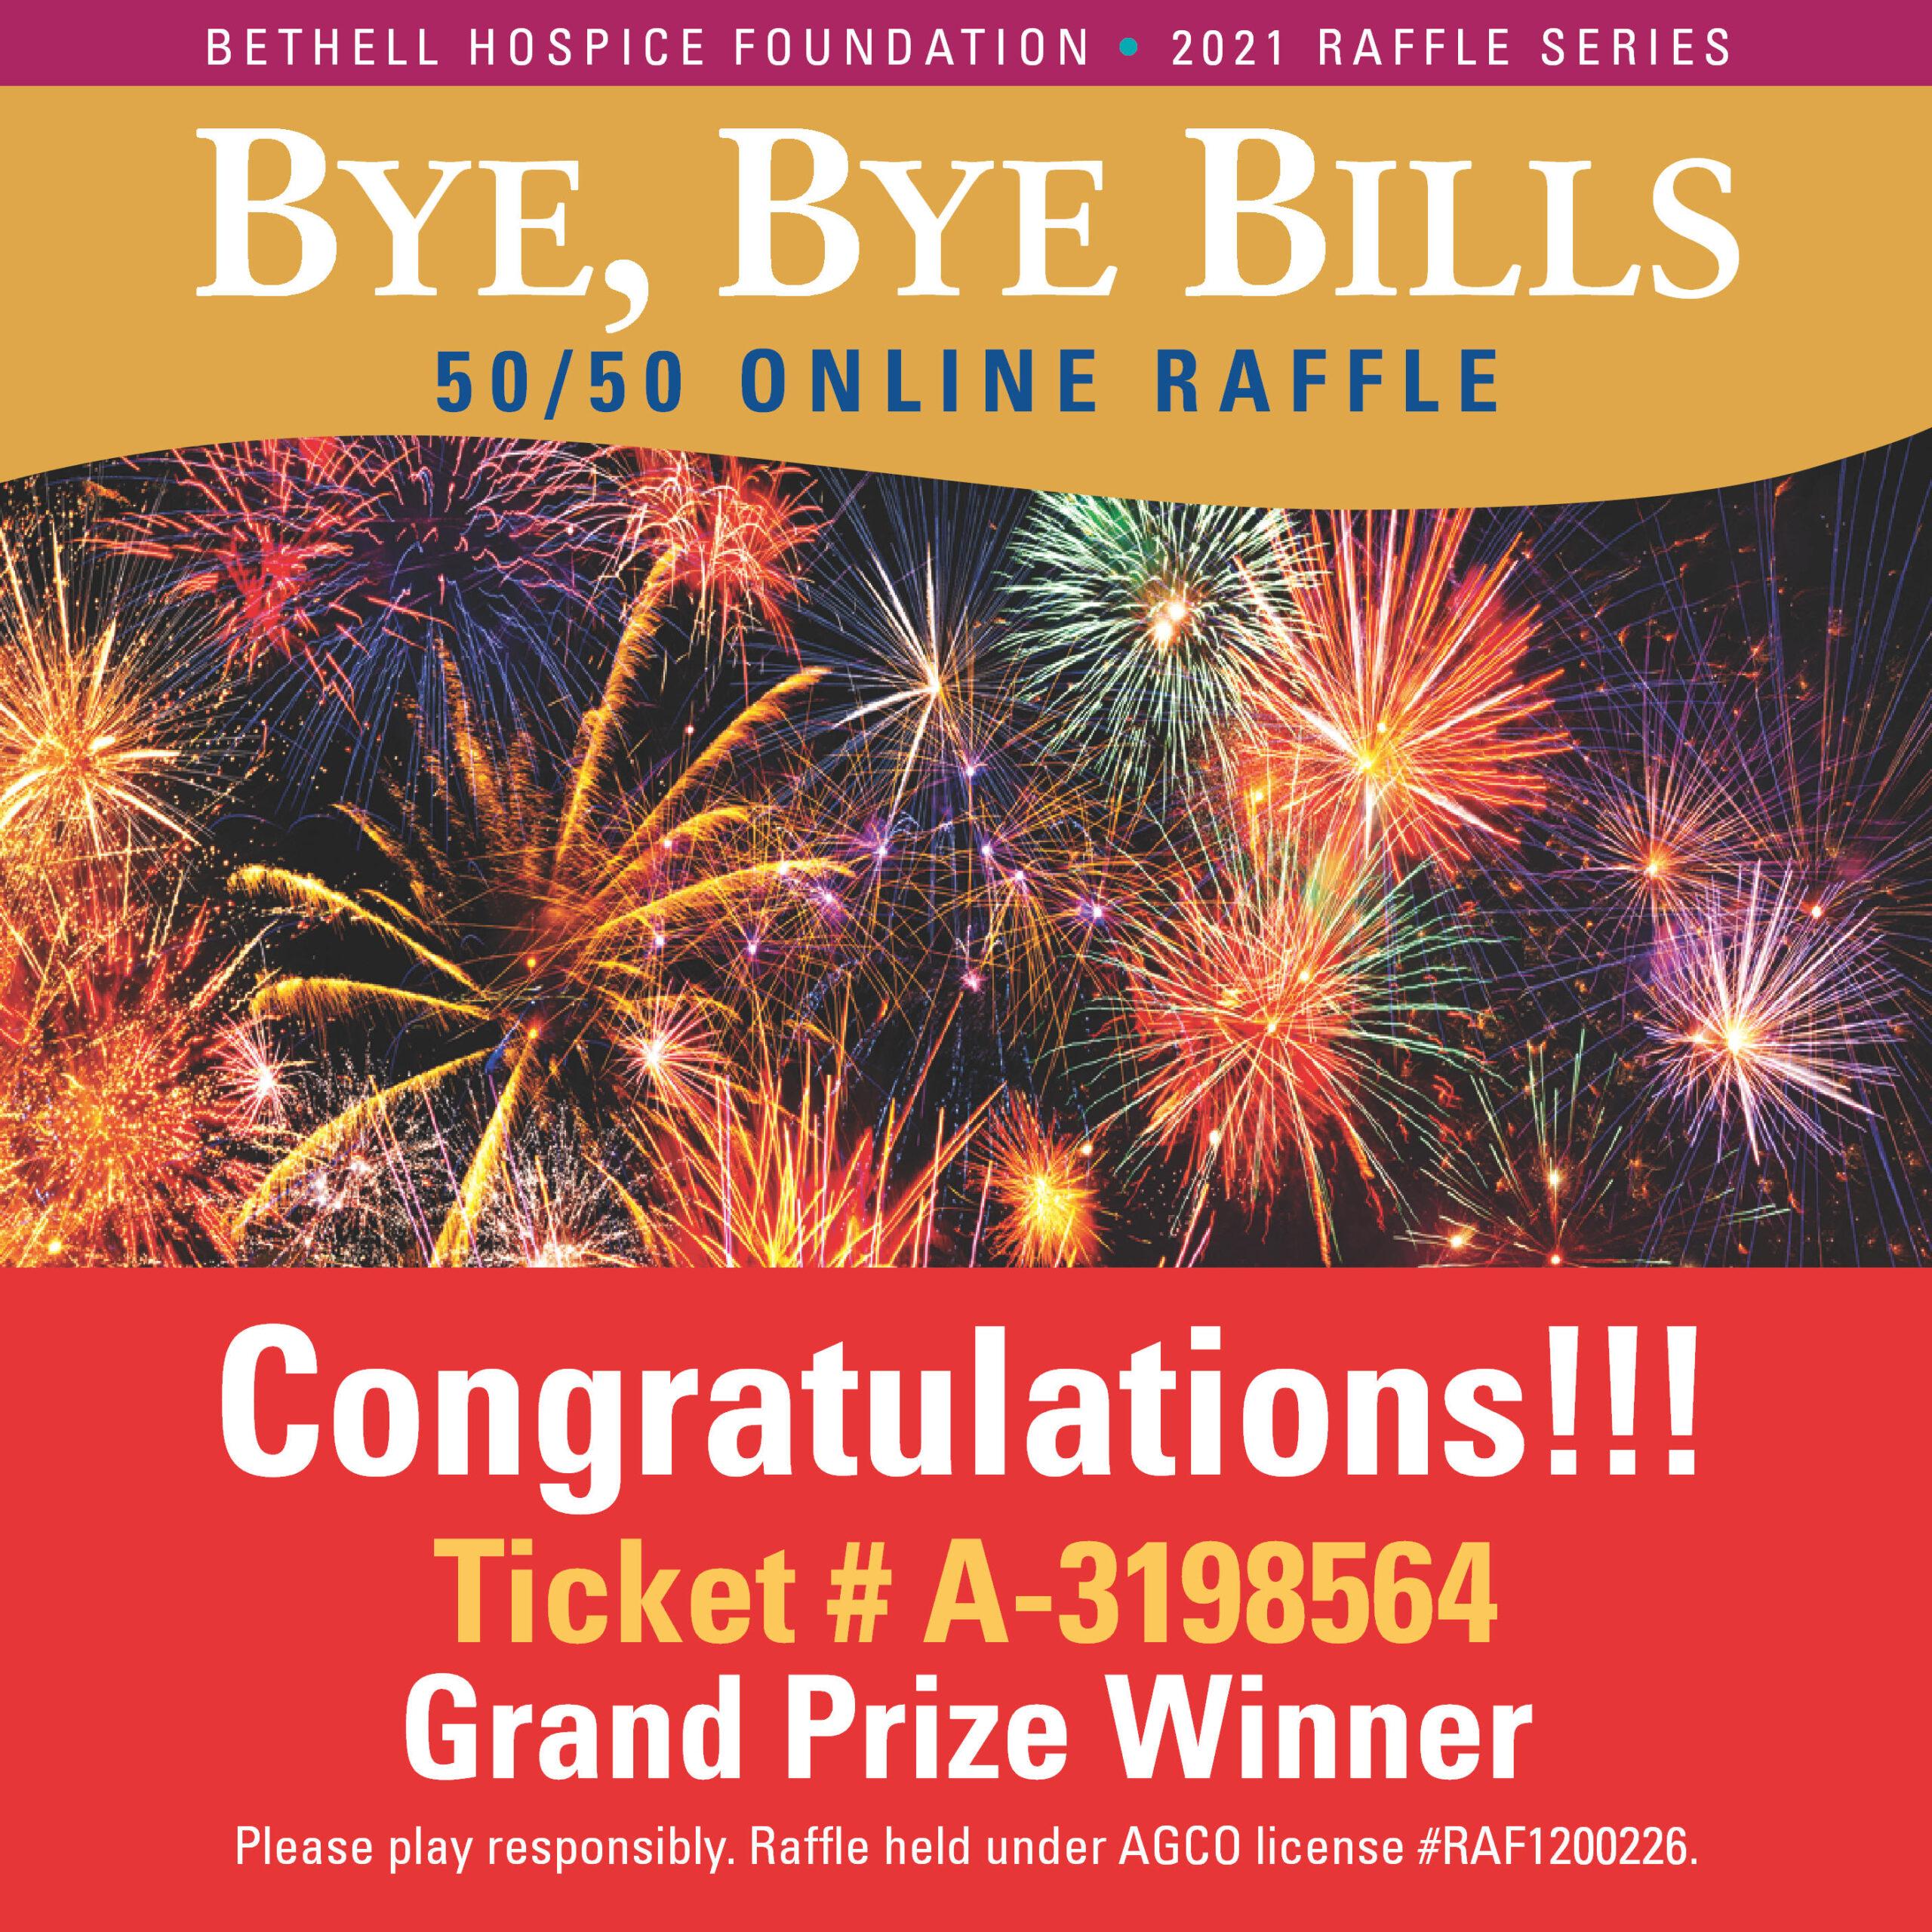 Bye Bye Bills 50/50 Raffle